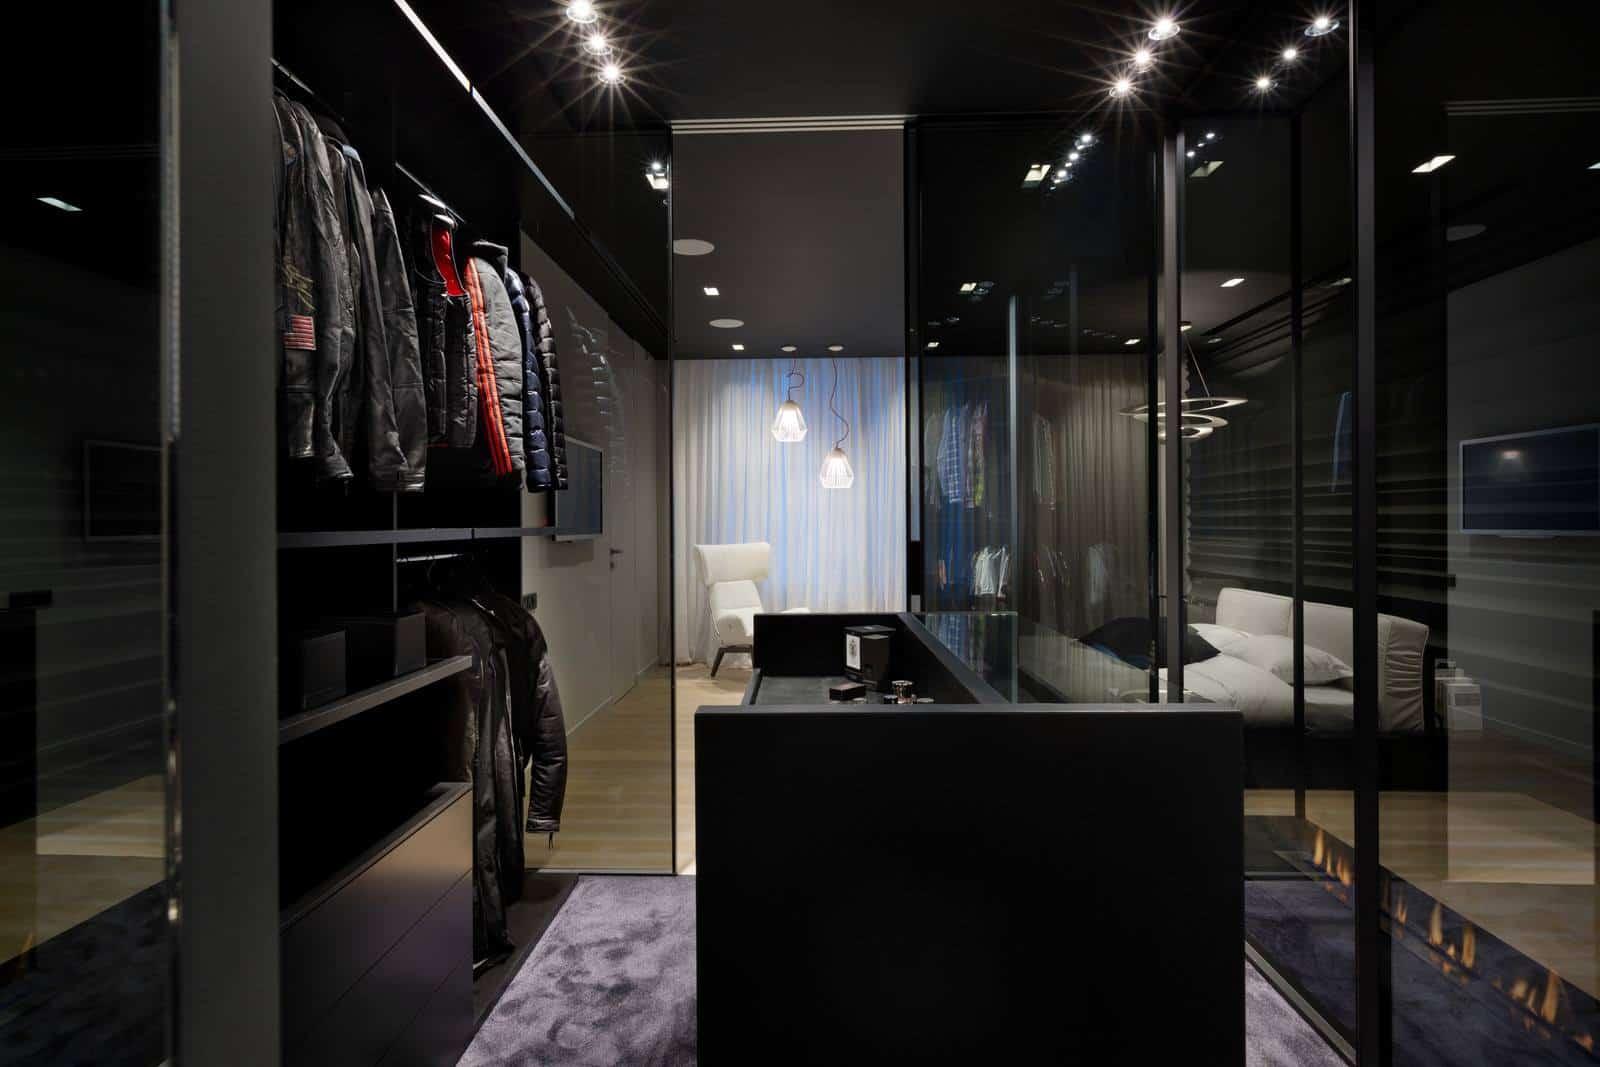 thiet-ke-noi-that-chung-cu-mai-dich-20 Thiết kế nội thất chung cư Mai Dịch - A. Sinh